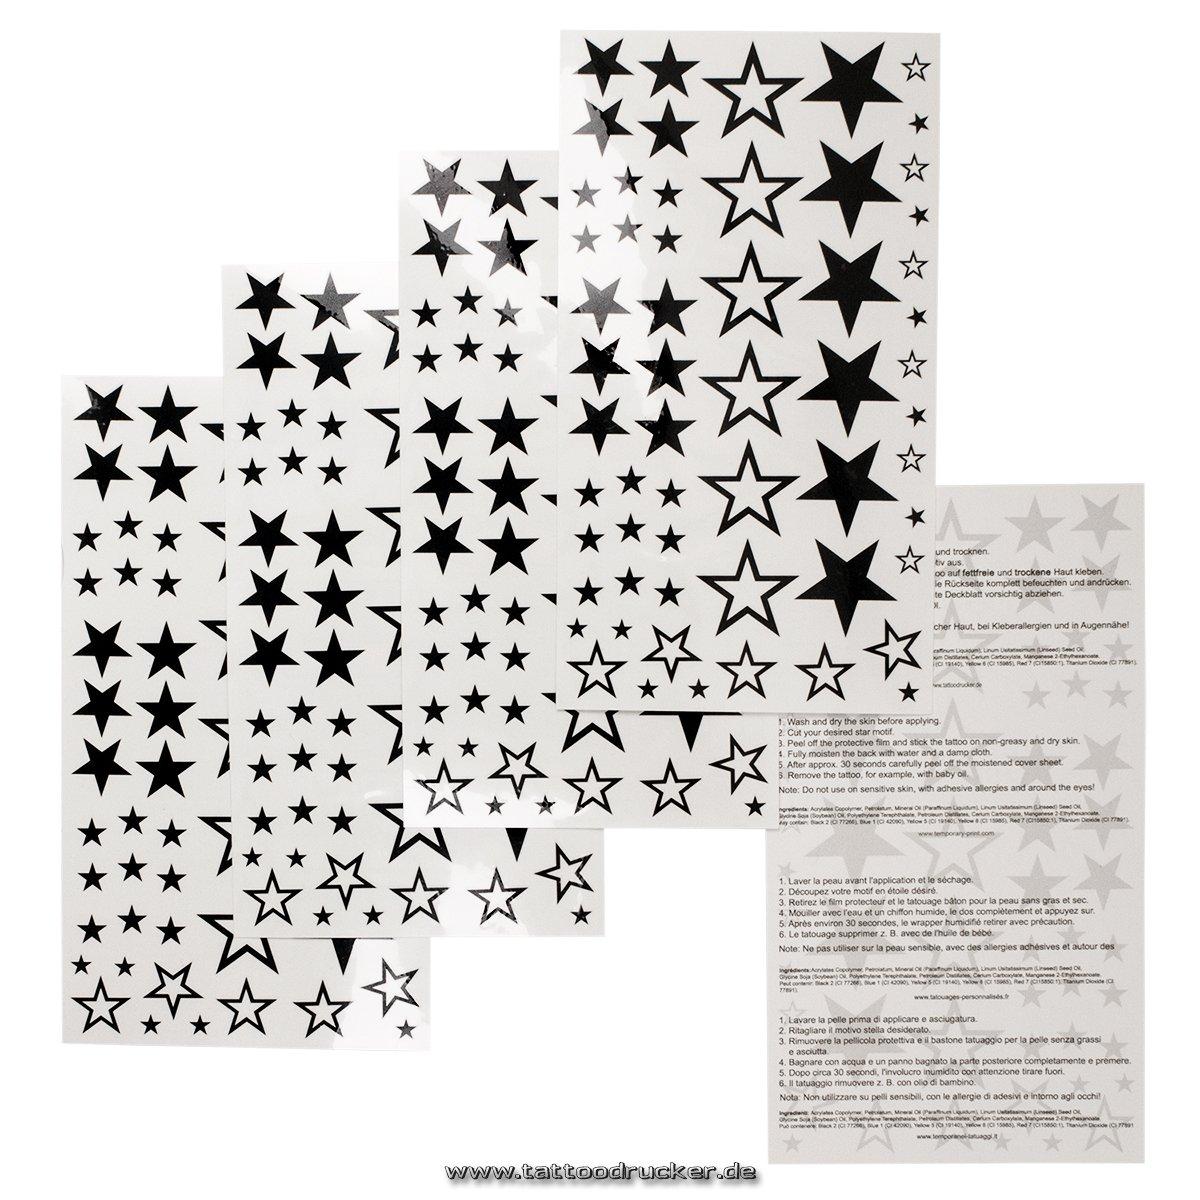 1 x 58 Estrellas tatuajes temporales nueva estrella fija falso hueco de cinco puntas - No China! (2) Tattoodrucker Stern-Karte1